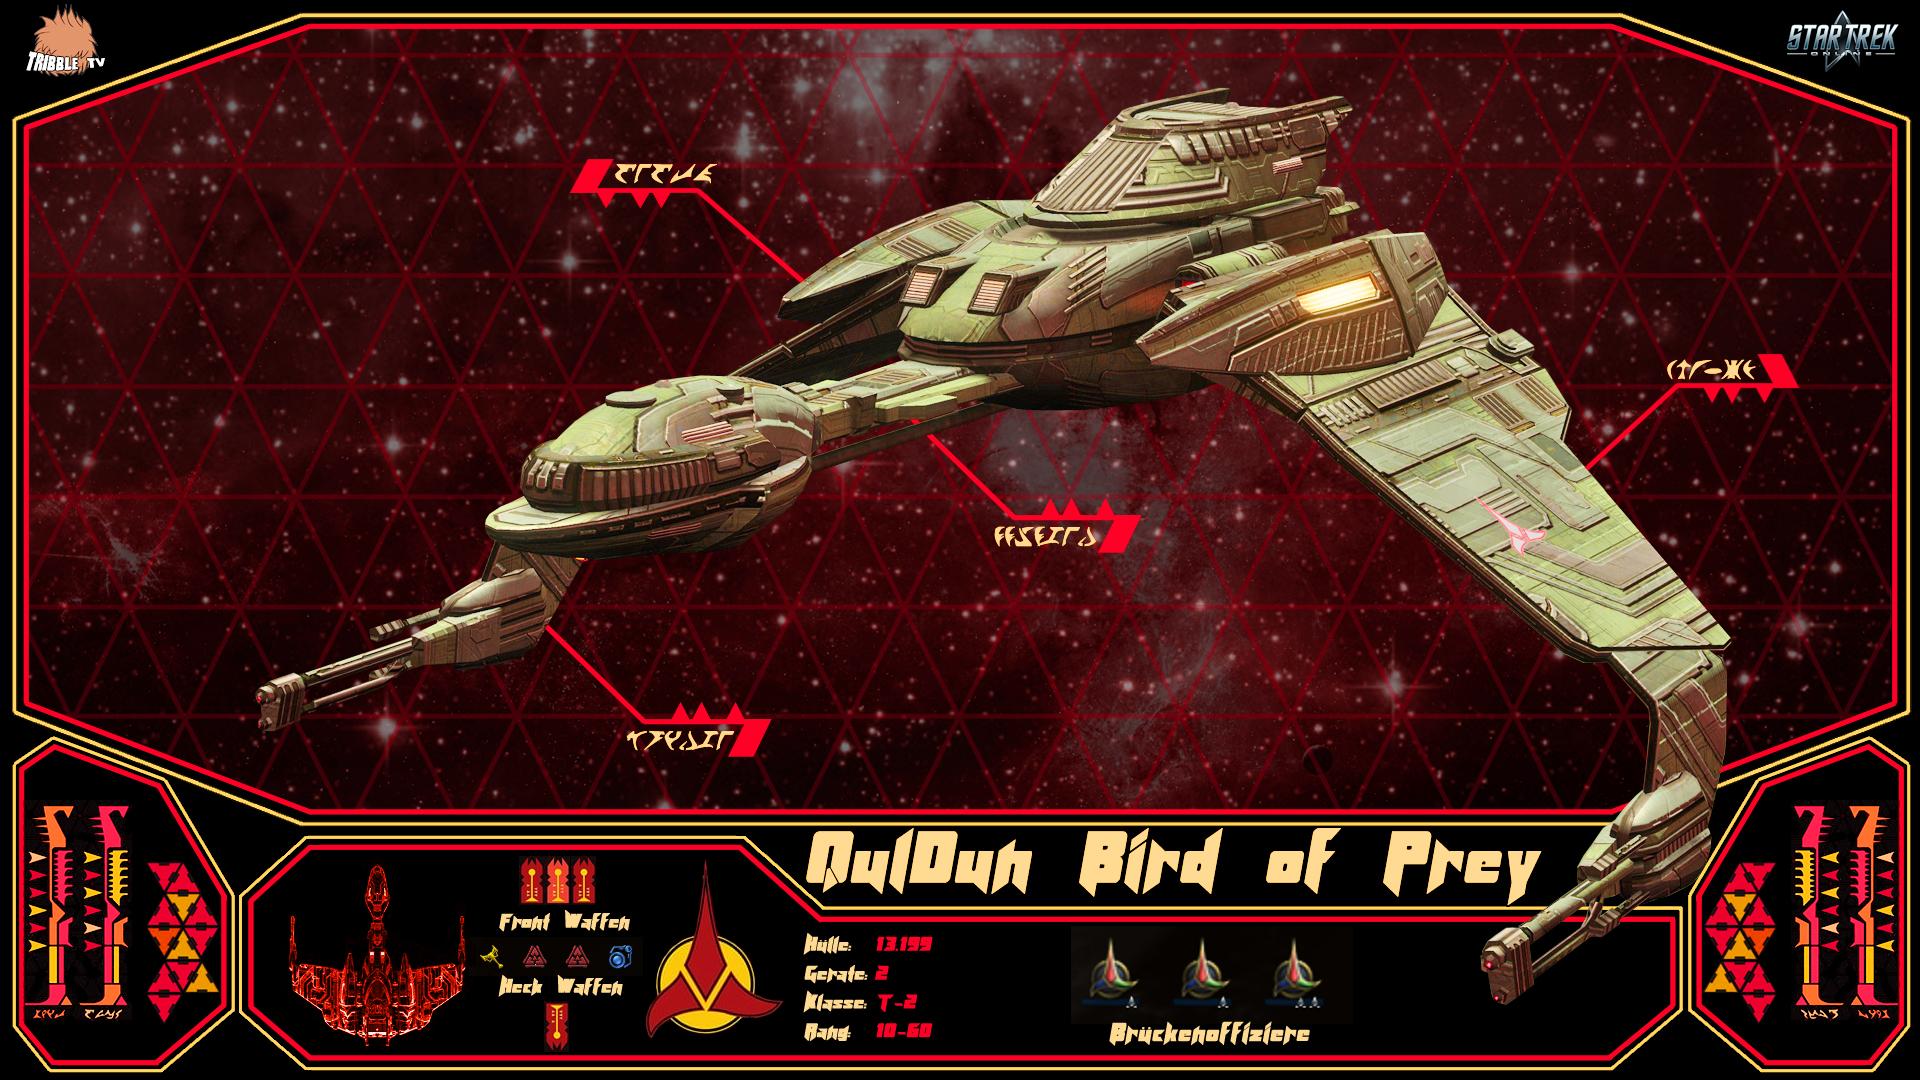 QulDun Bird of Prey T-2